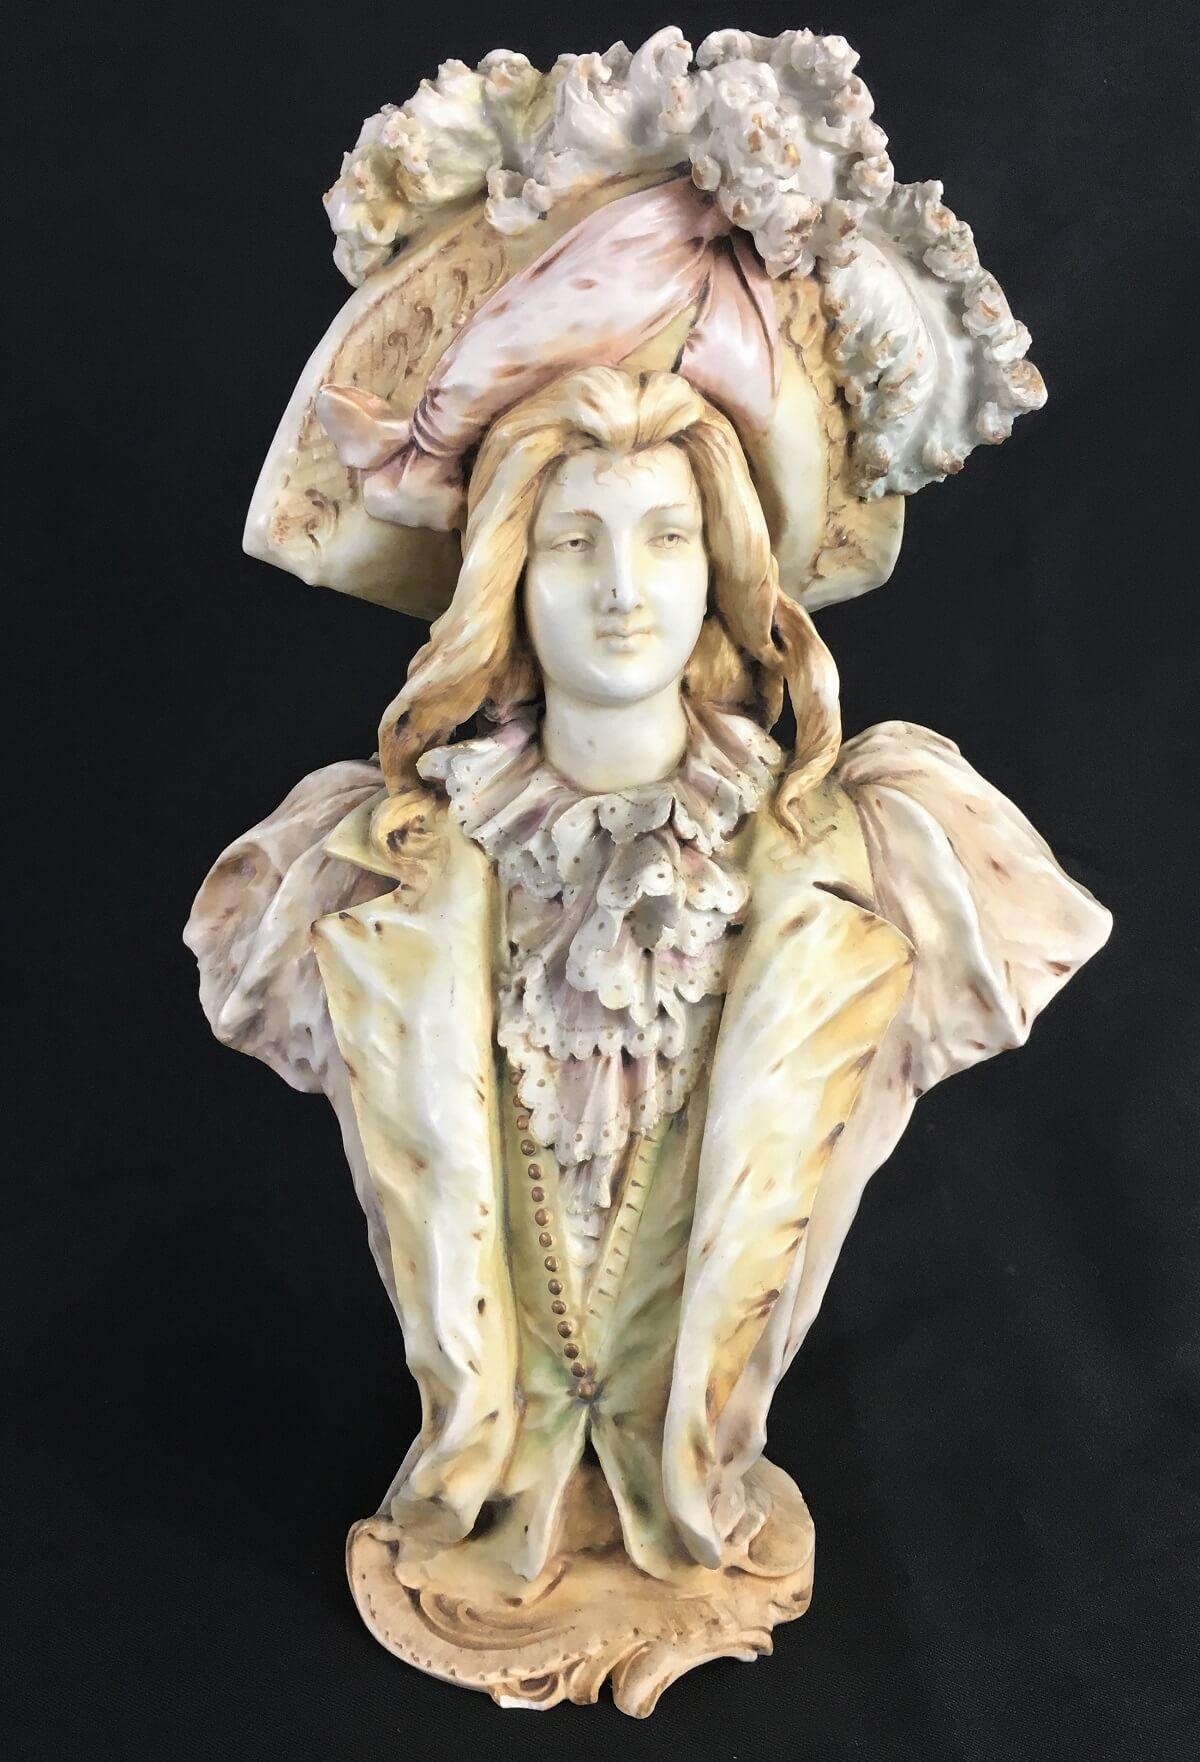 Magnifica Escultura Porcelana Antiga Austriaca Teplitz Bohemia